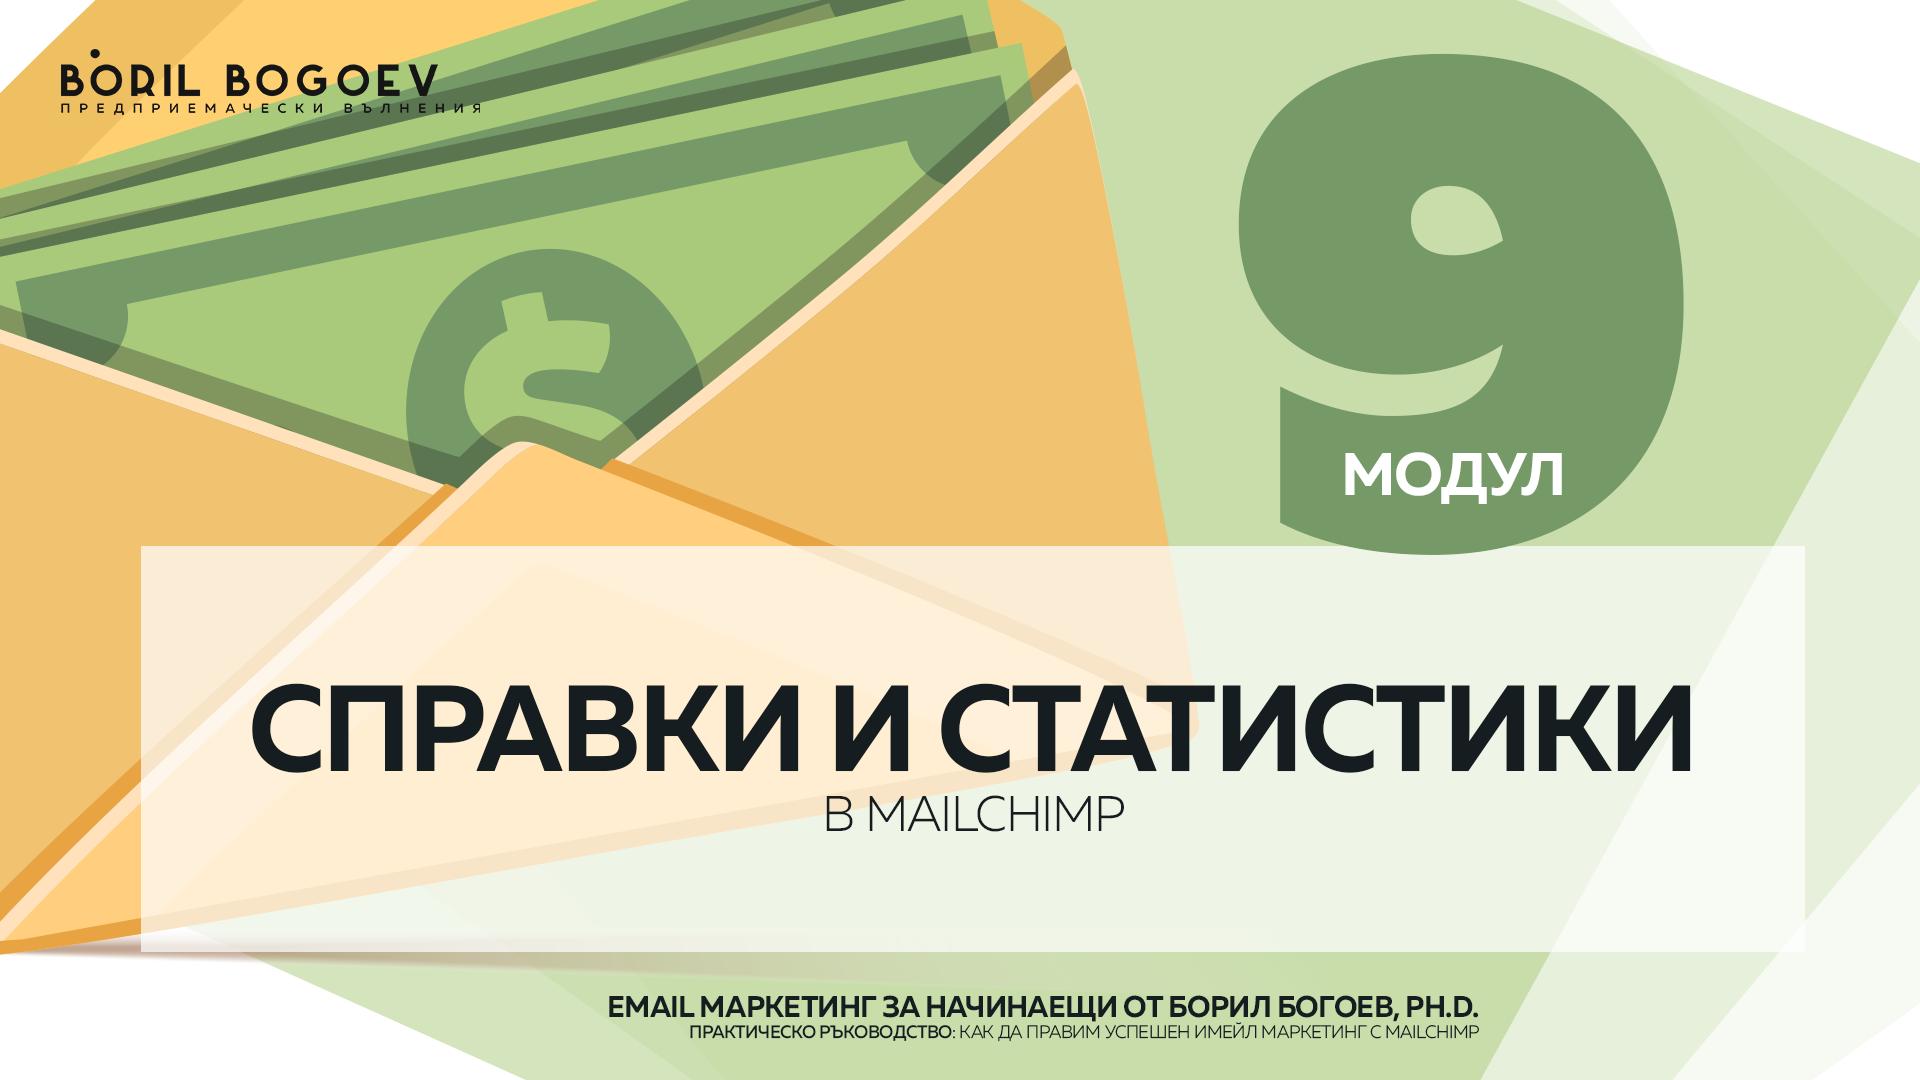 emb-presentation-m9